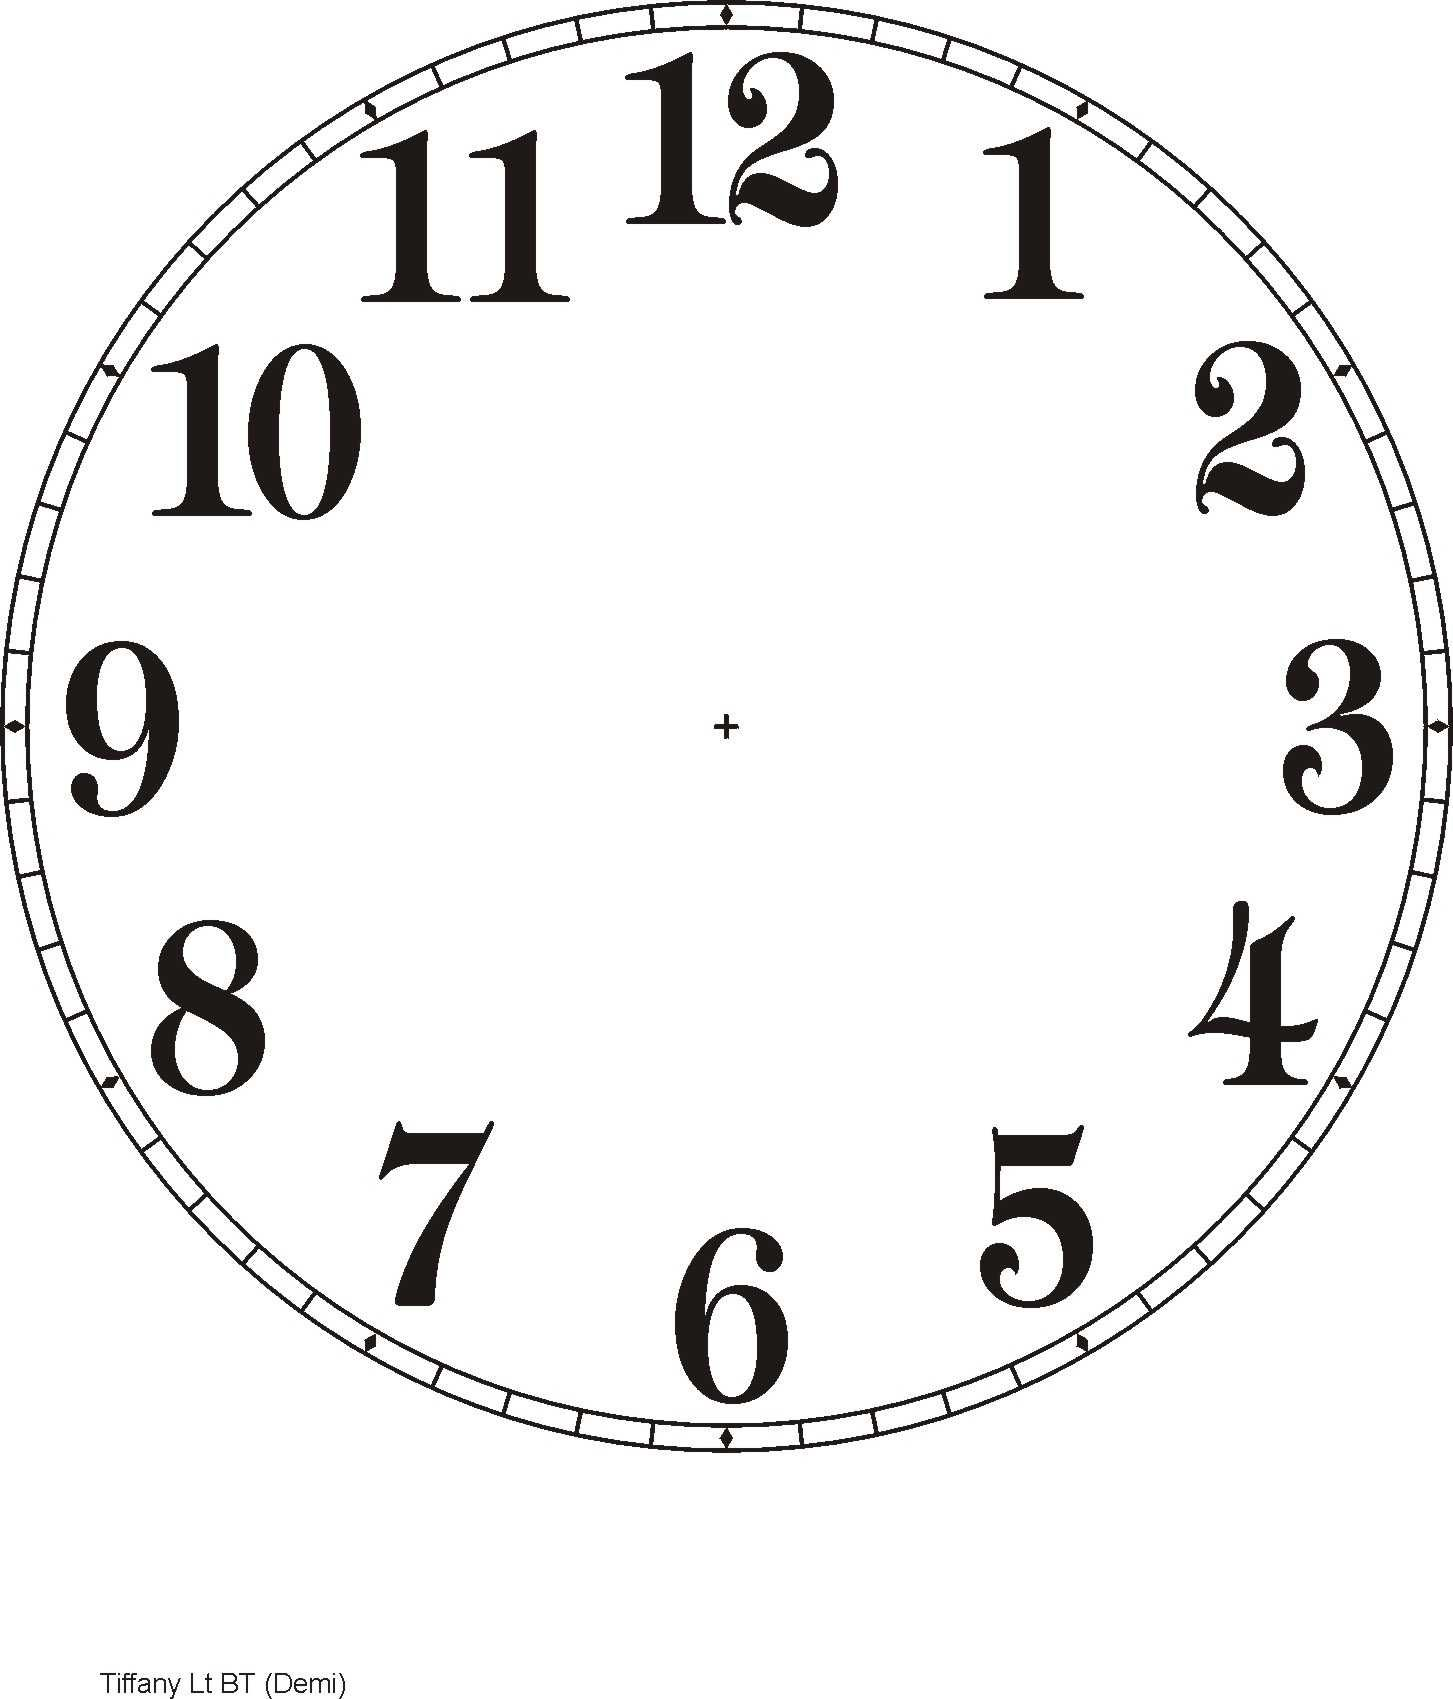 Terrific Template Clock Calgi Seattlebaby Co Wiring Cloud Waroletkolfr09Org